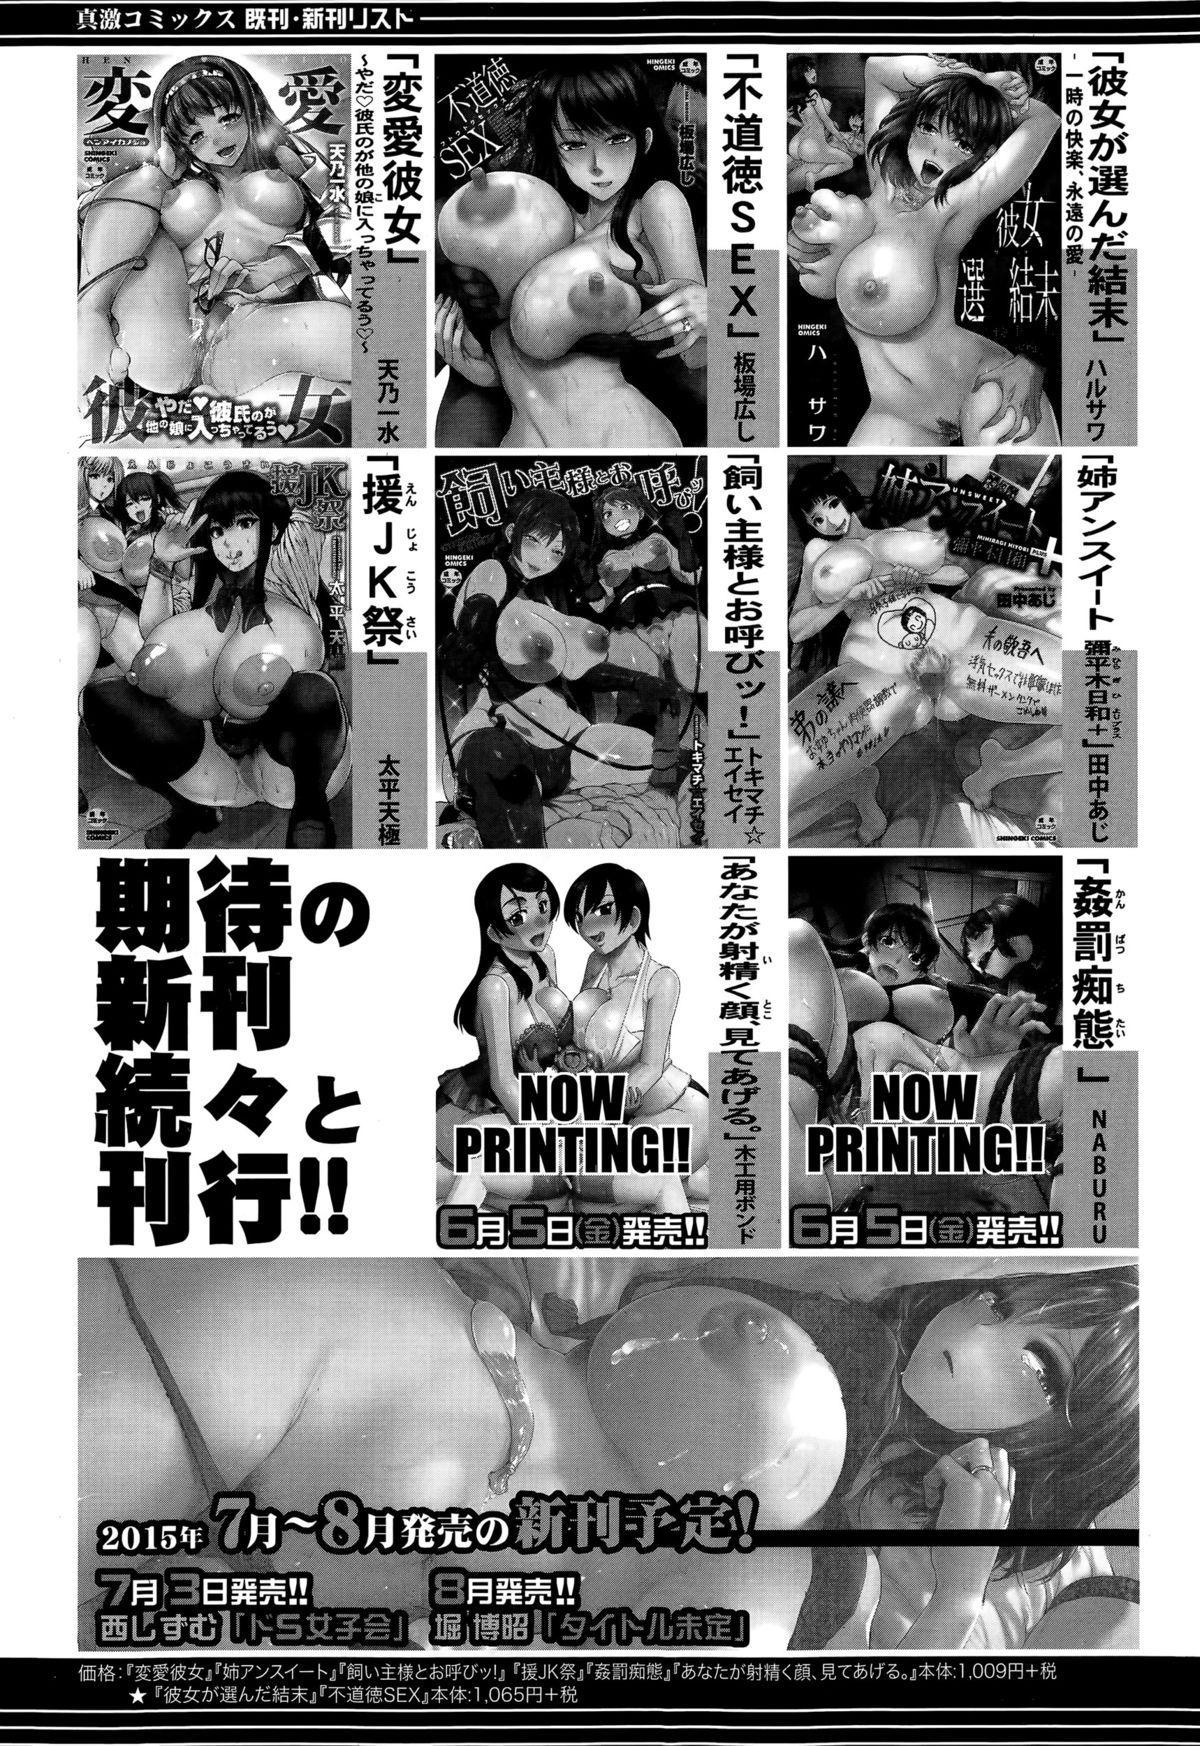 COMIC Shingeki 2015-07 357